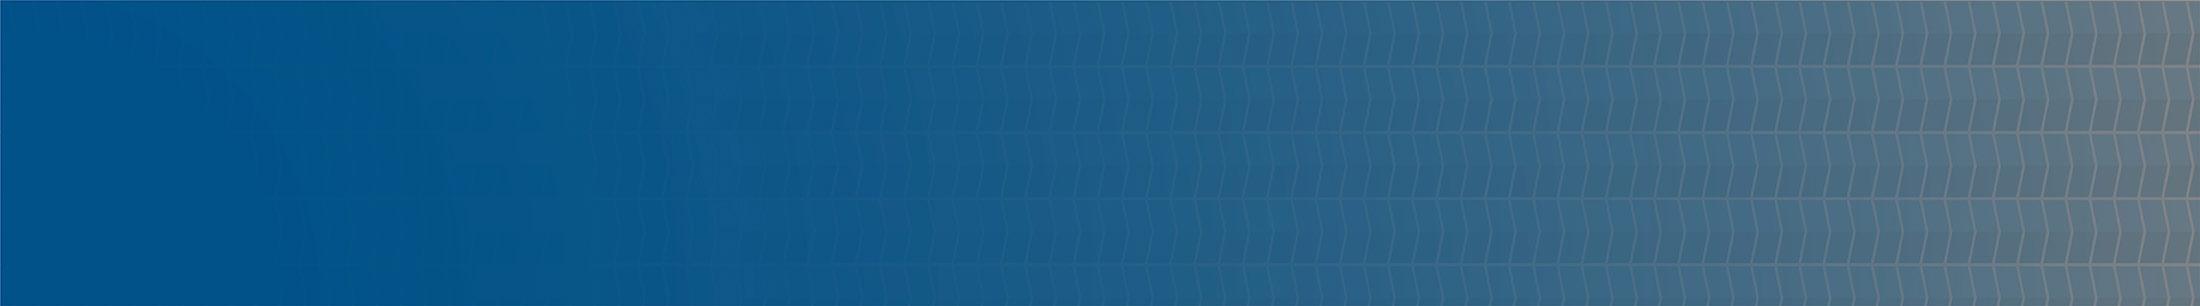 Blue-Pohlman-Background